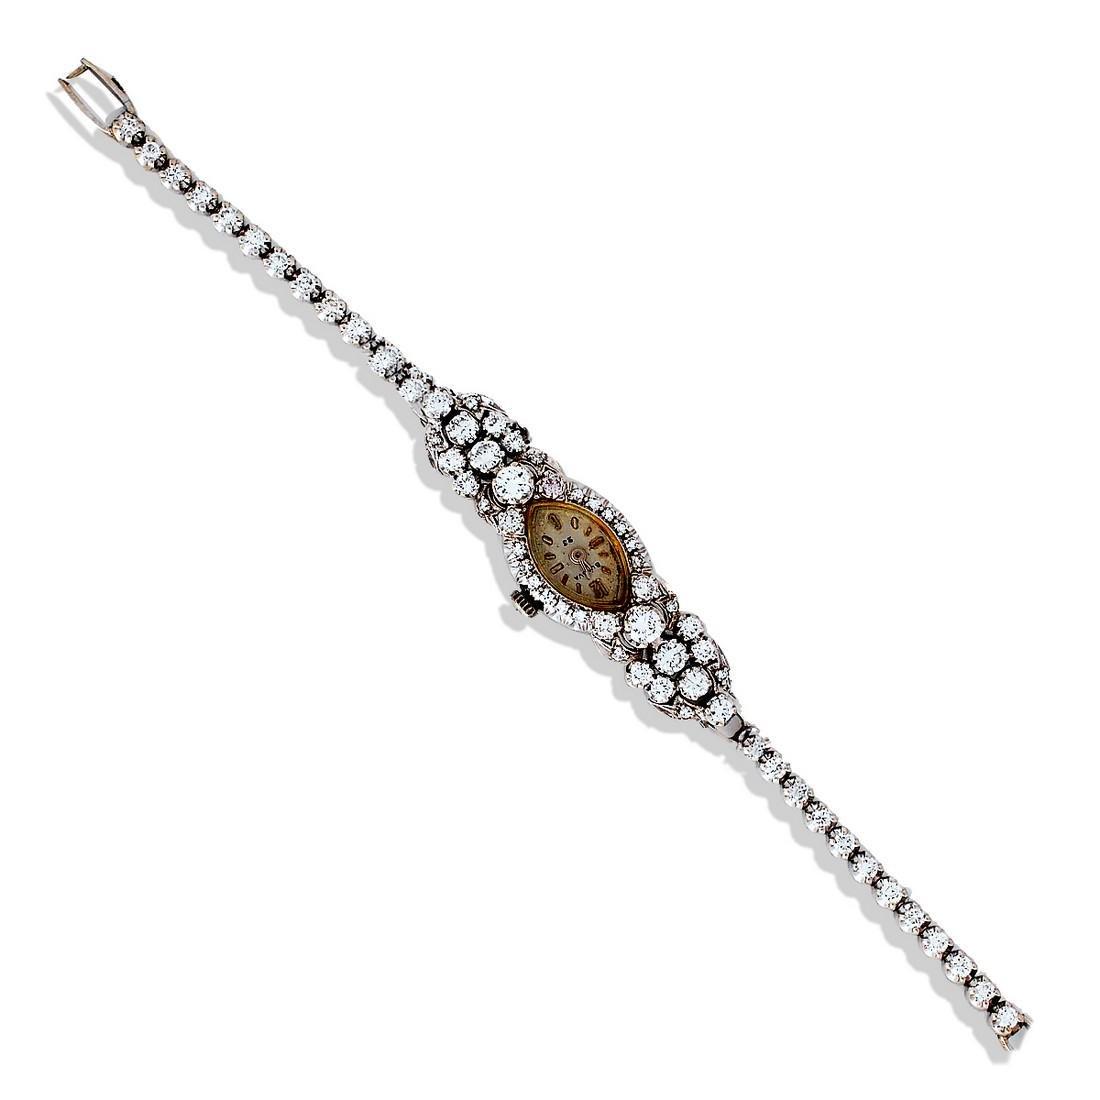 Victorian, Estate 3.40 Carat Diamond Watch, 14 karat